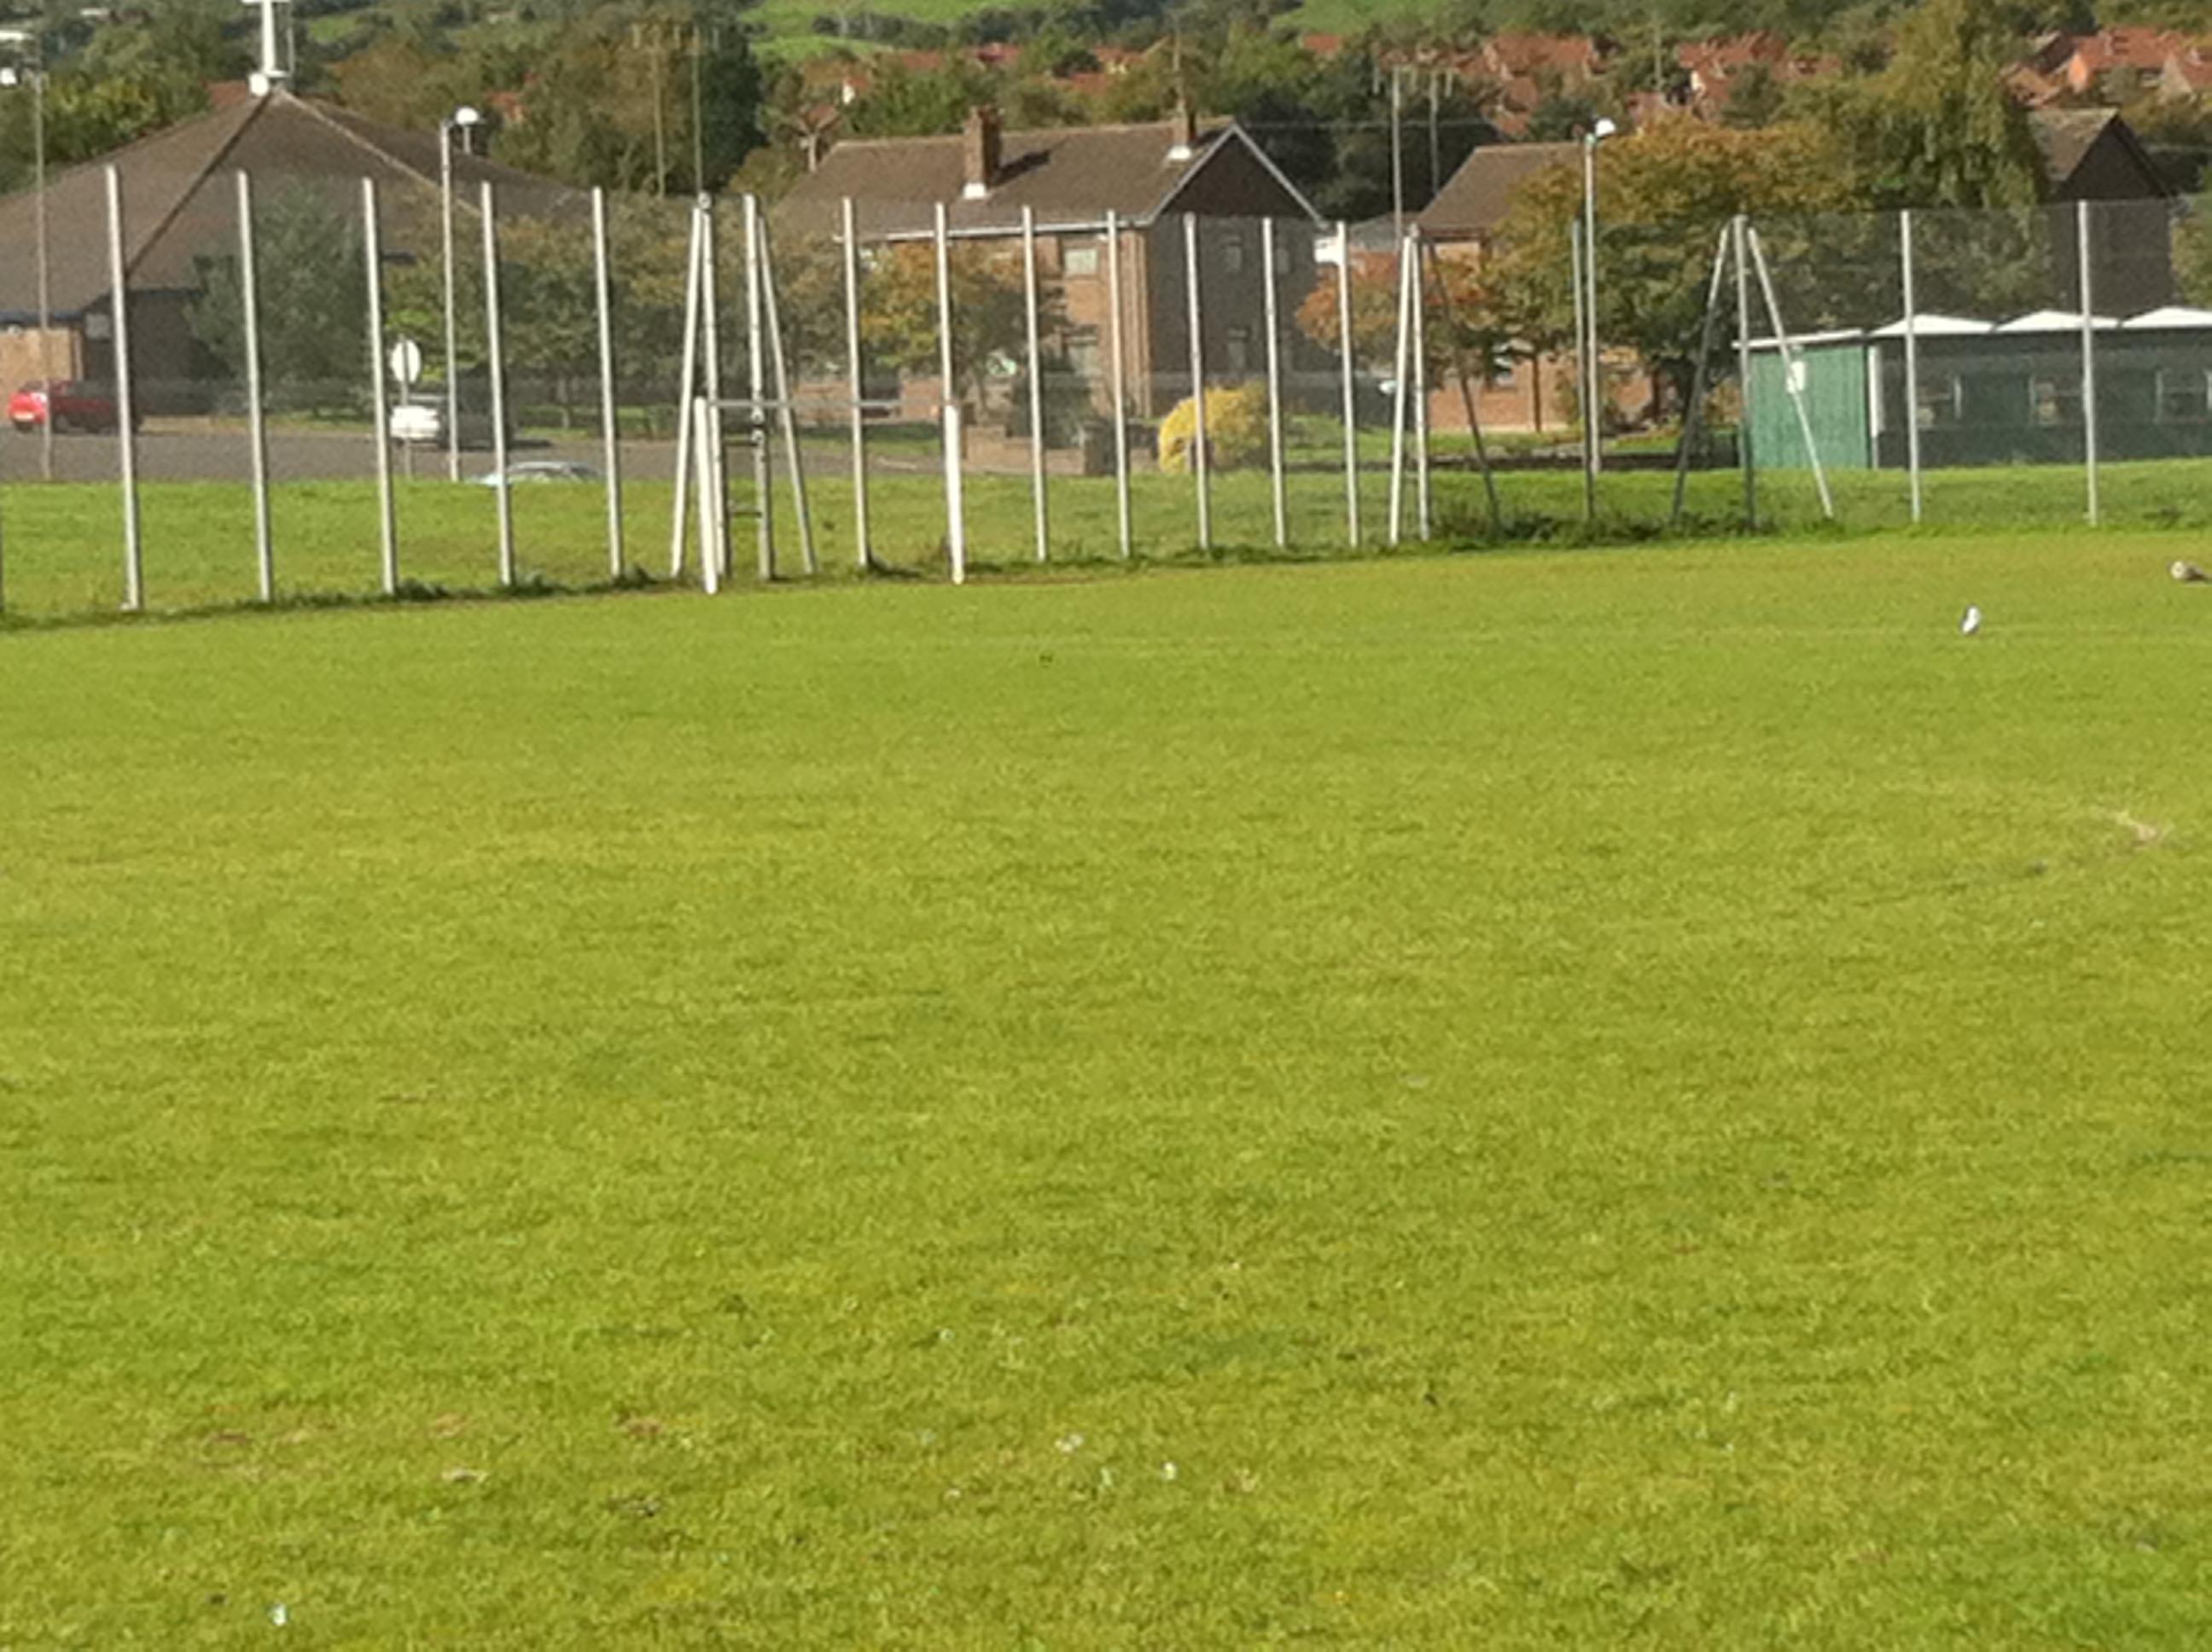 Northern Amateur Football League Brooke Activity Centre Grass Pitch